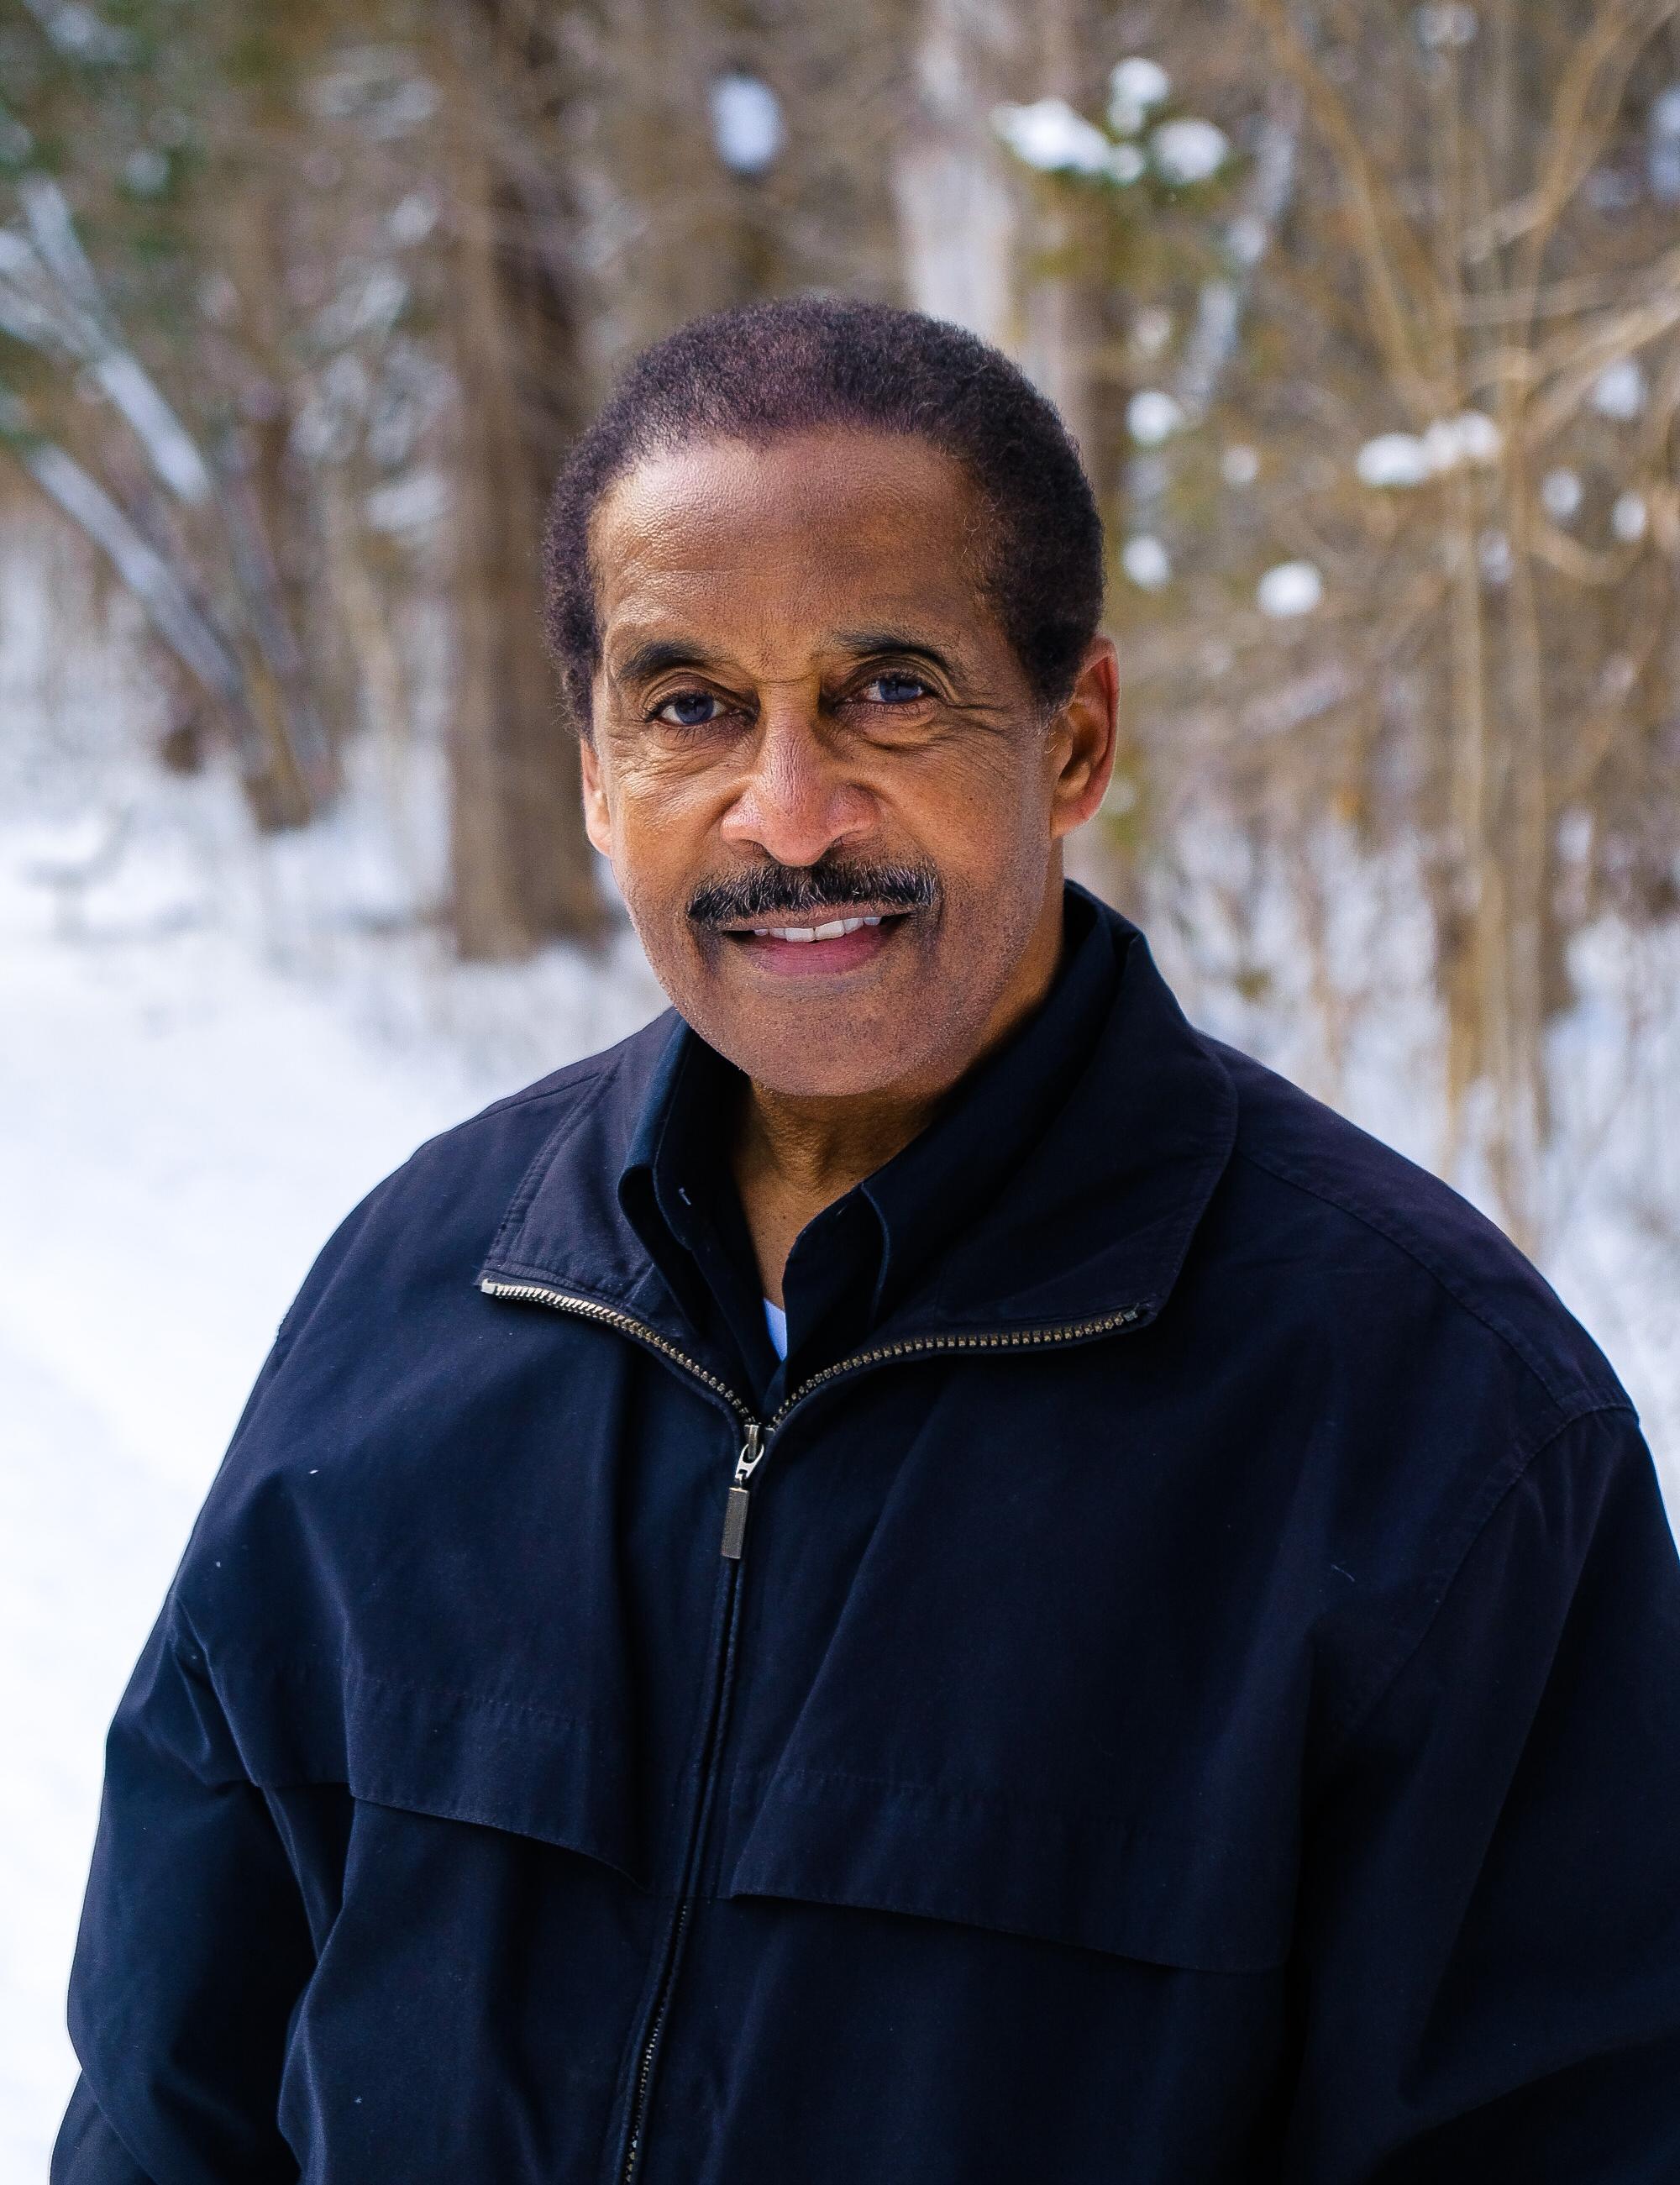 Jerry Bransford, 70